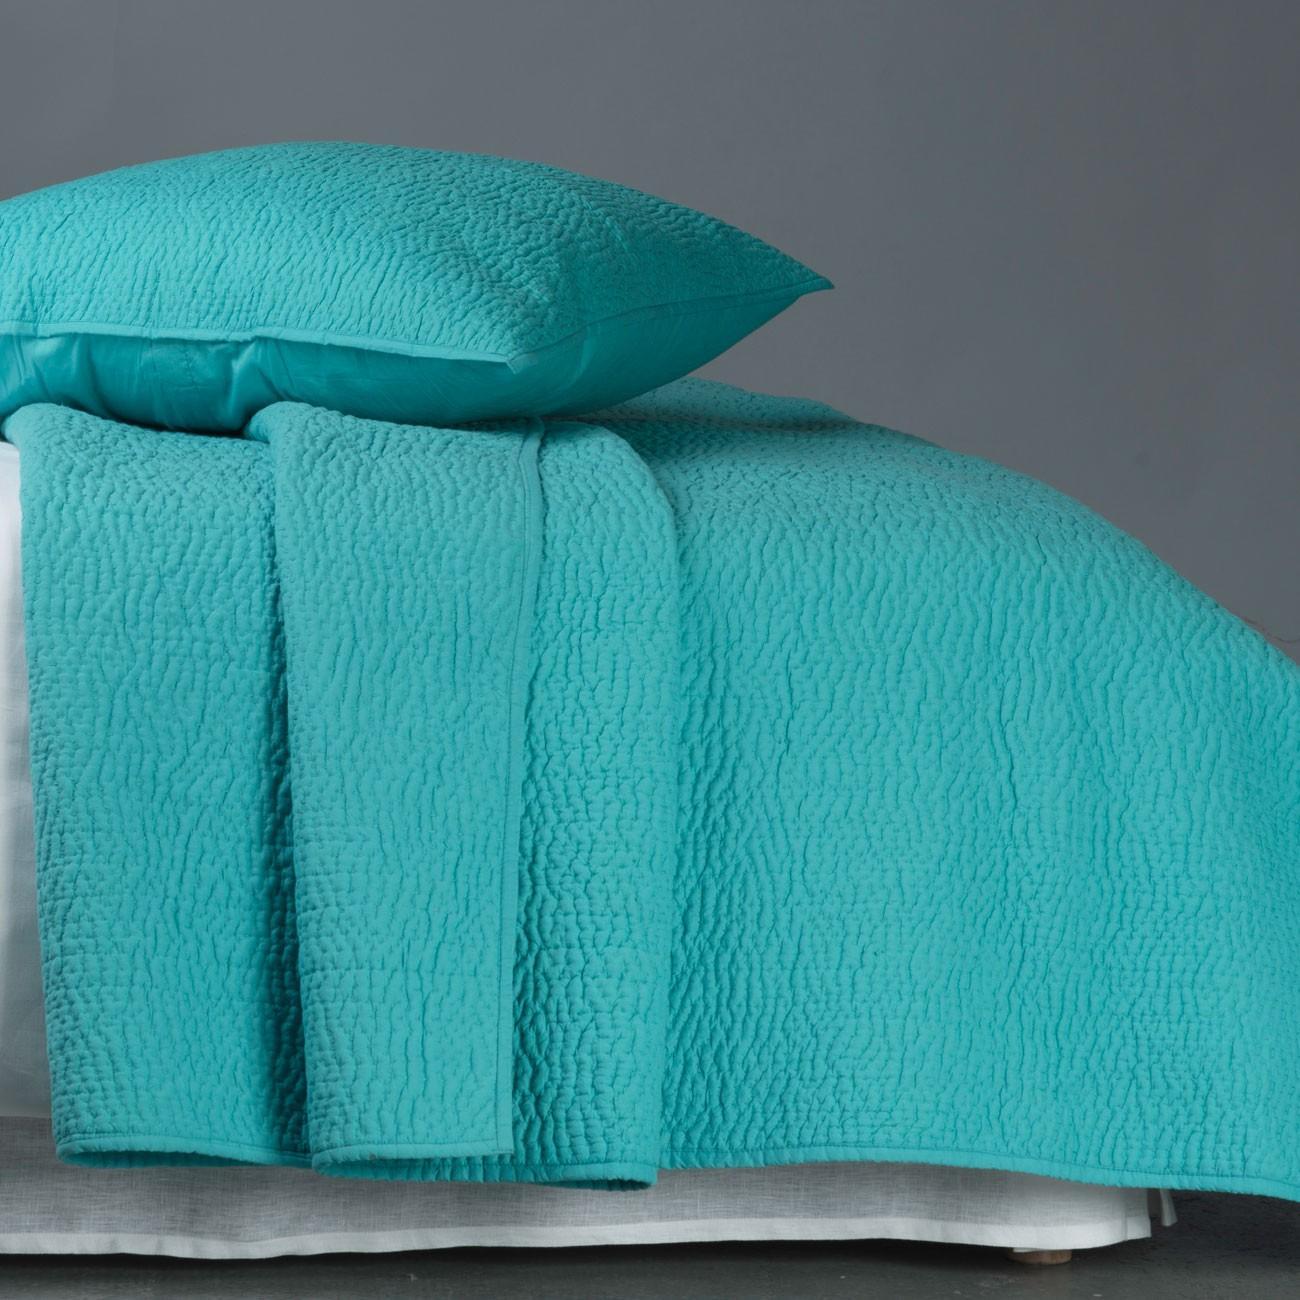 couvre lit turquoise. Black Bedroom Furniture Sets. Home Design Ideas